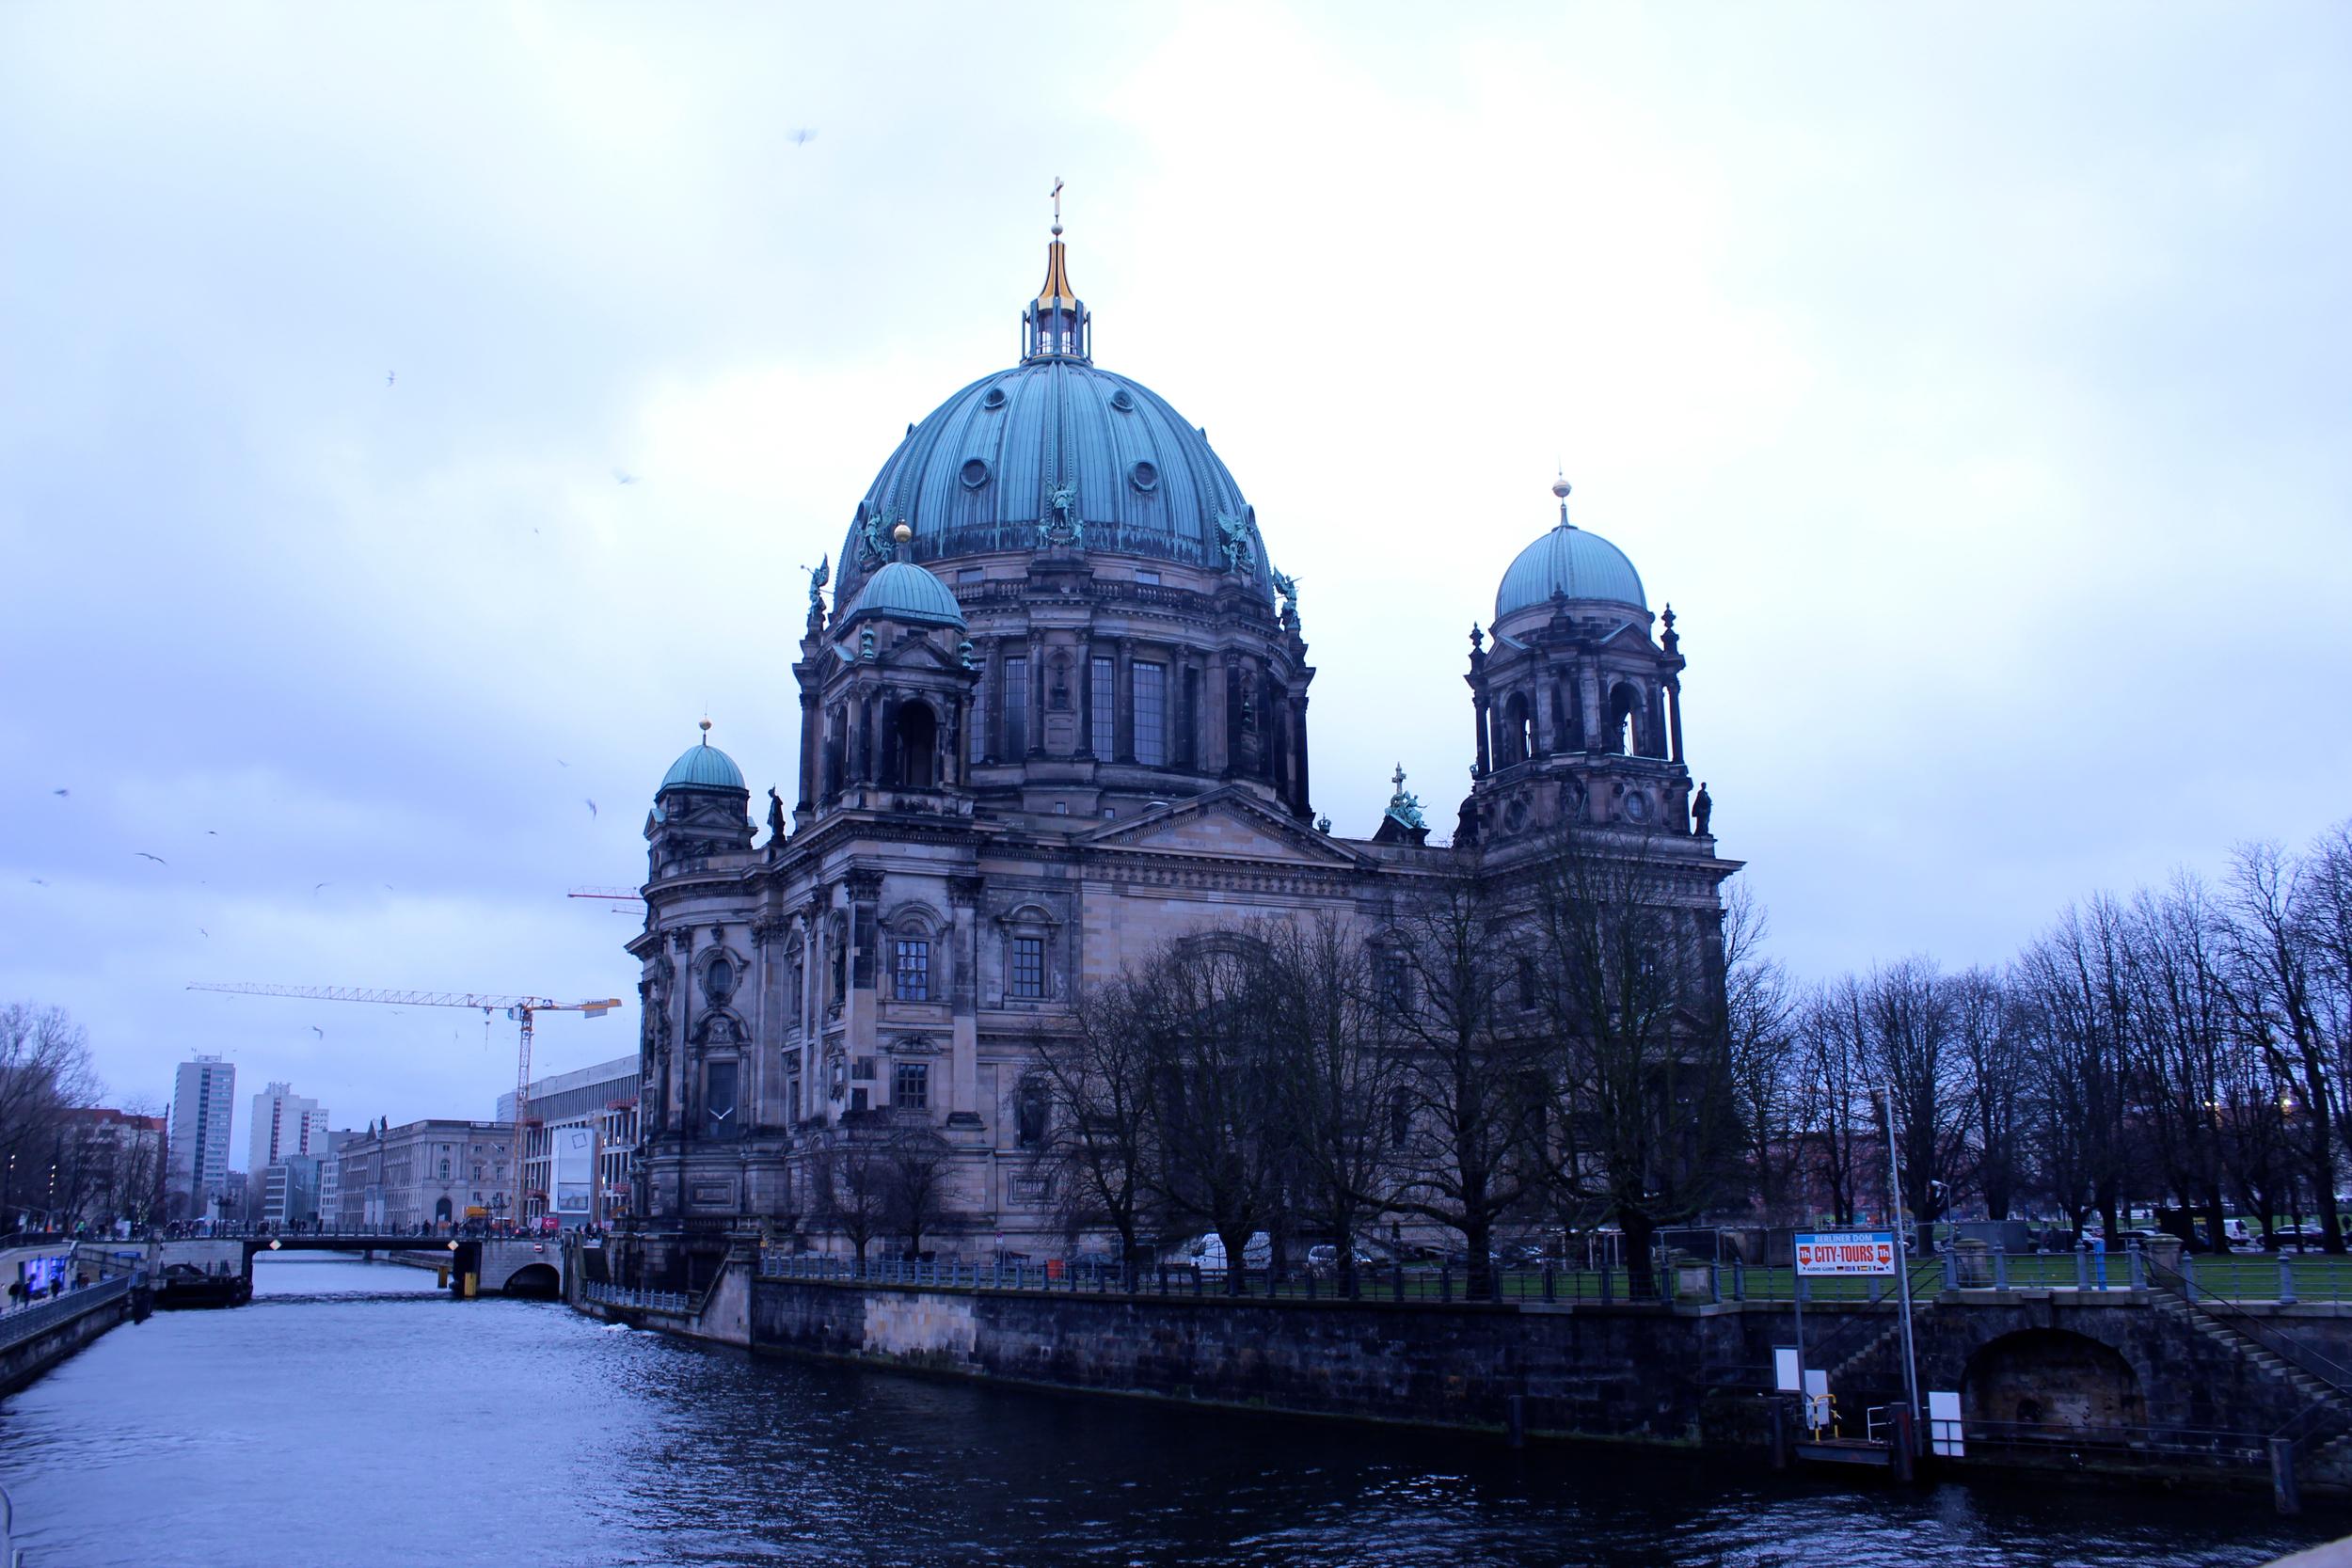 Berliner Dom / Berlin Cathedral